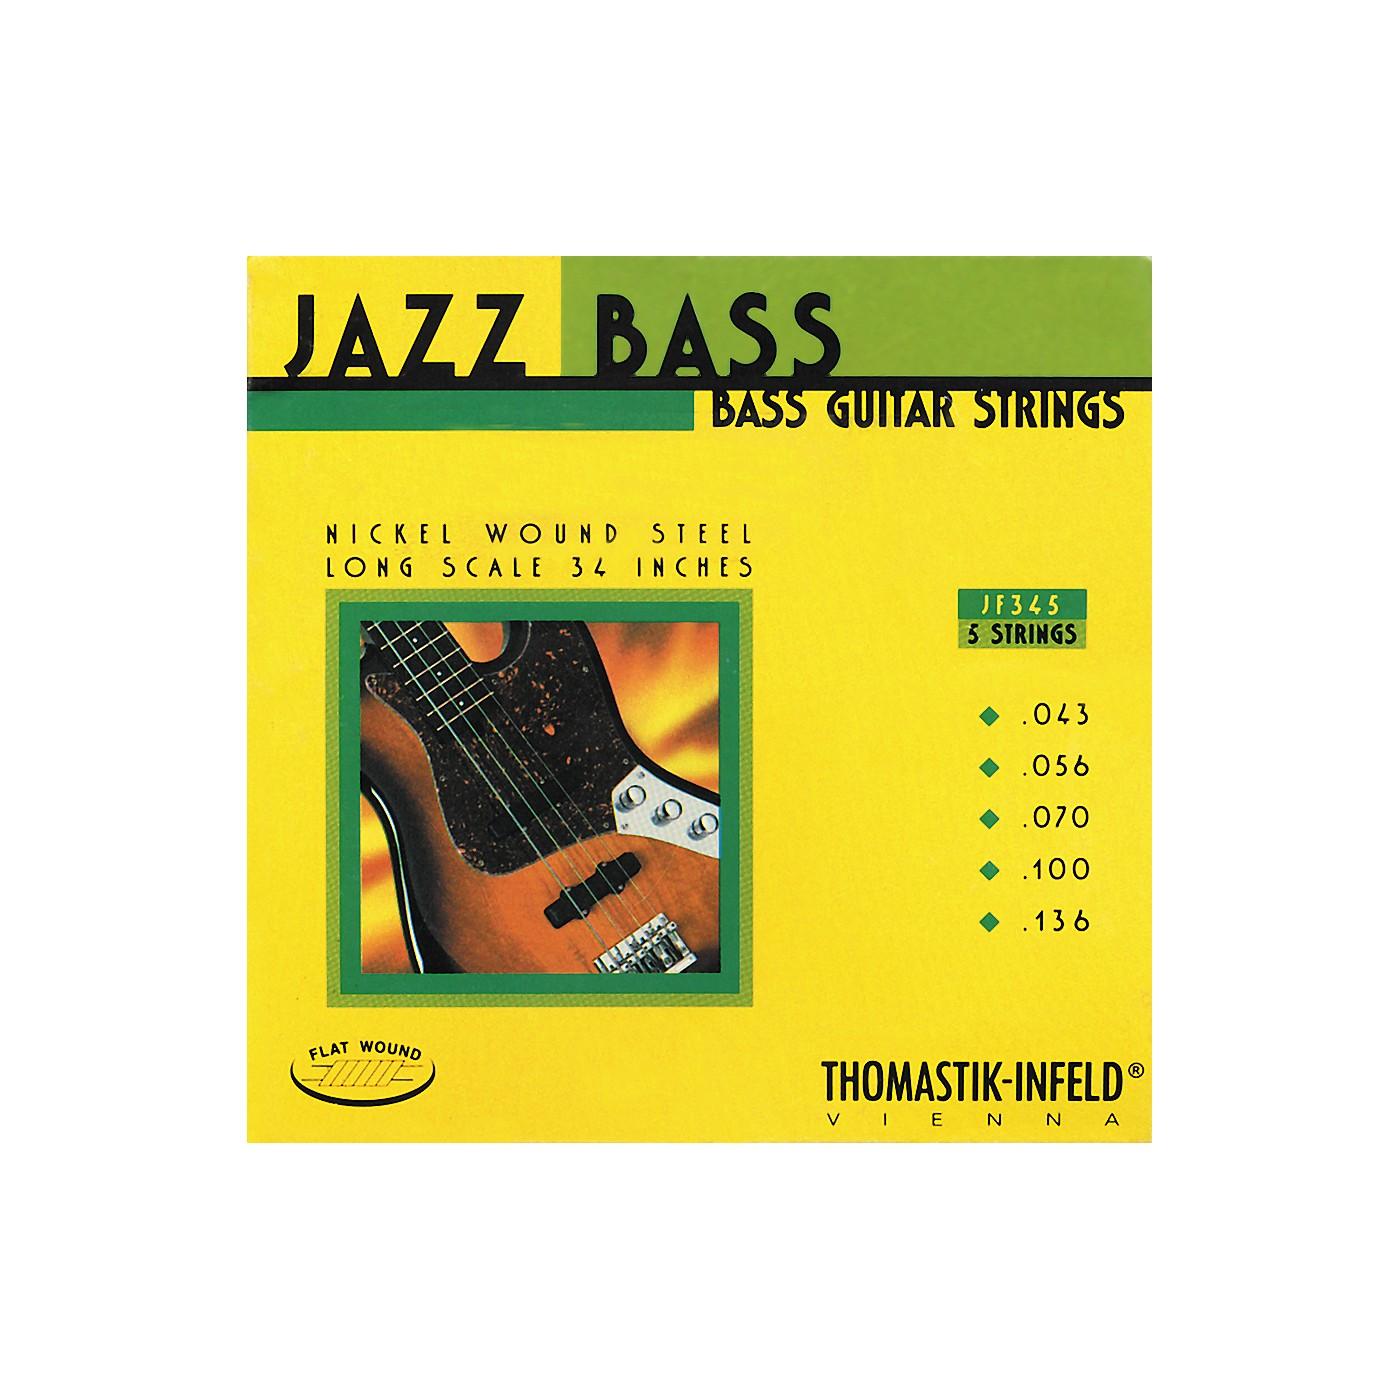 Thomastik JF345 Flatwound 5-String Jazz Bass Strings thumbnail